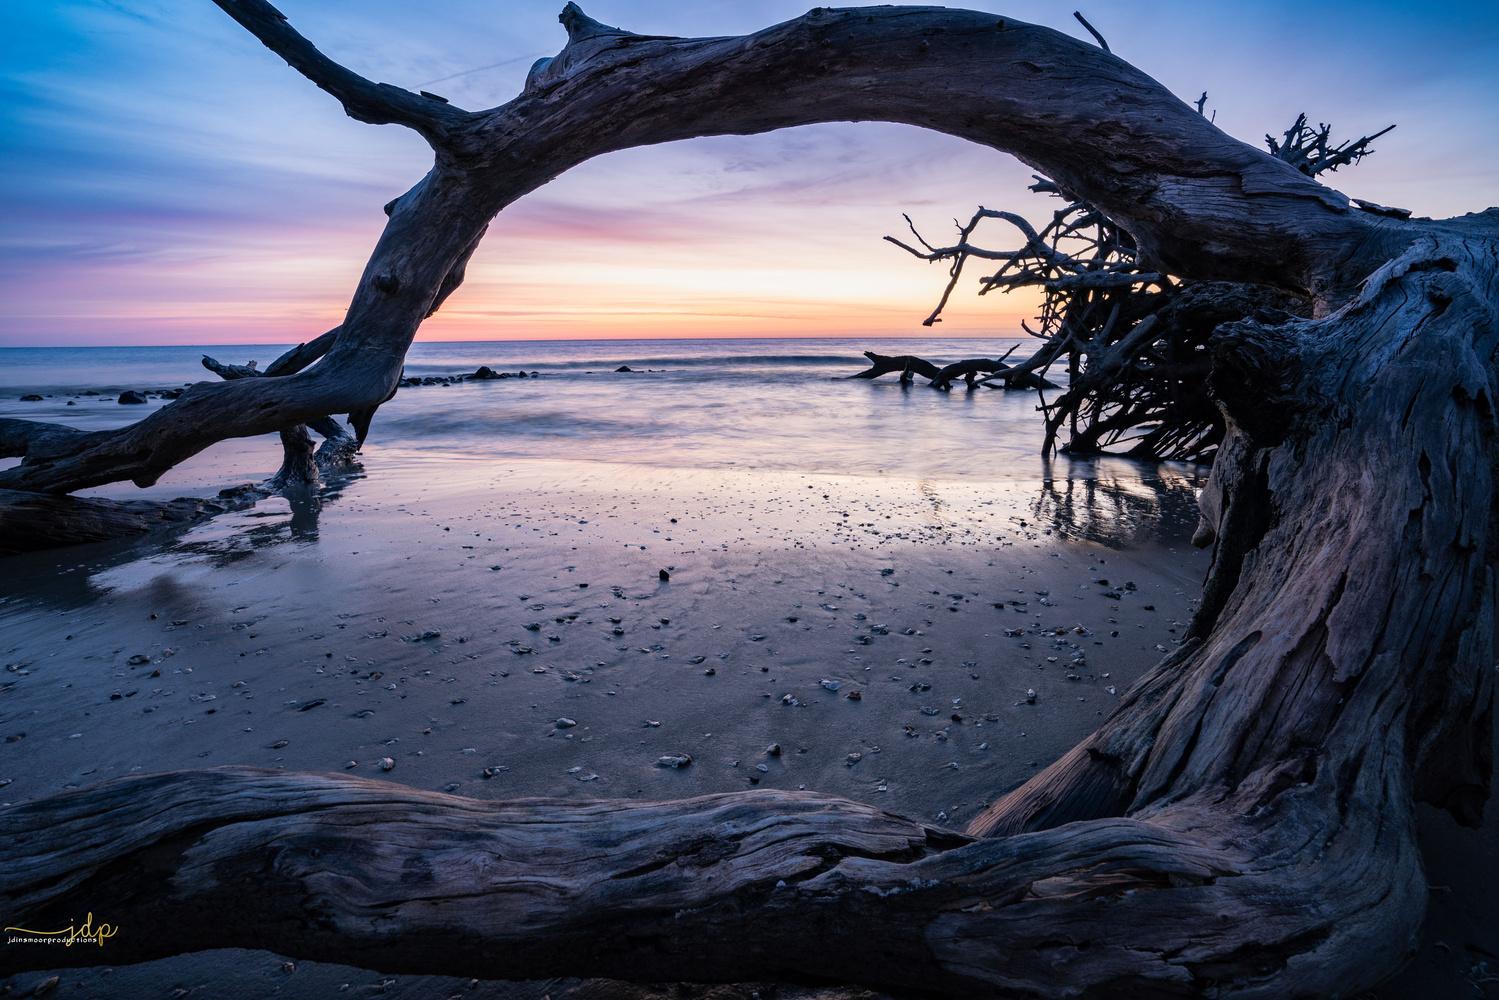 Dead frame by James Dinsmoor